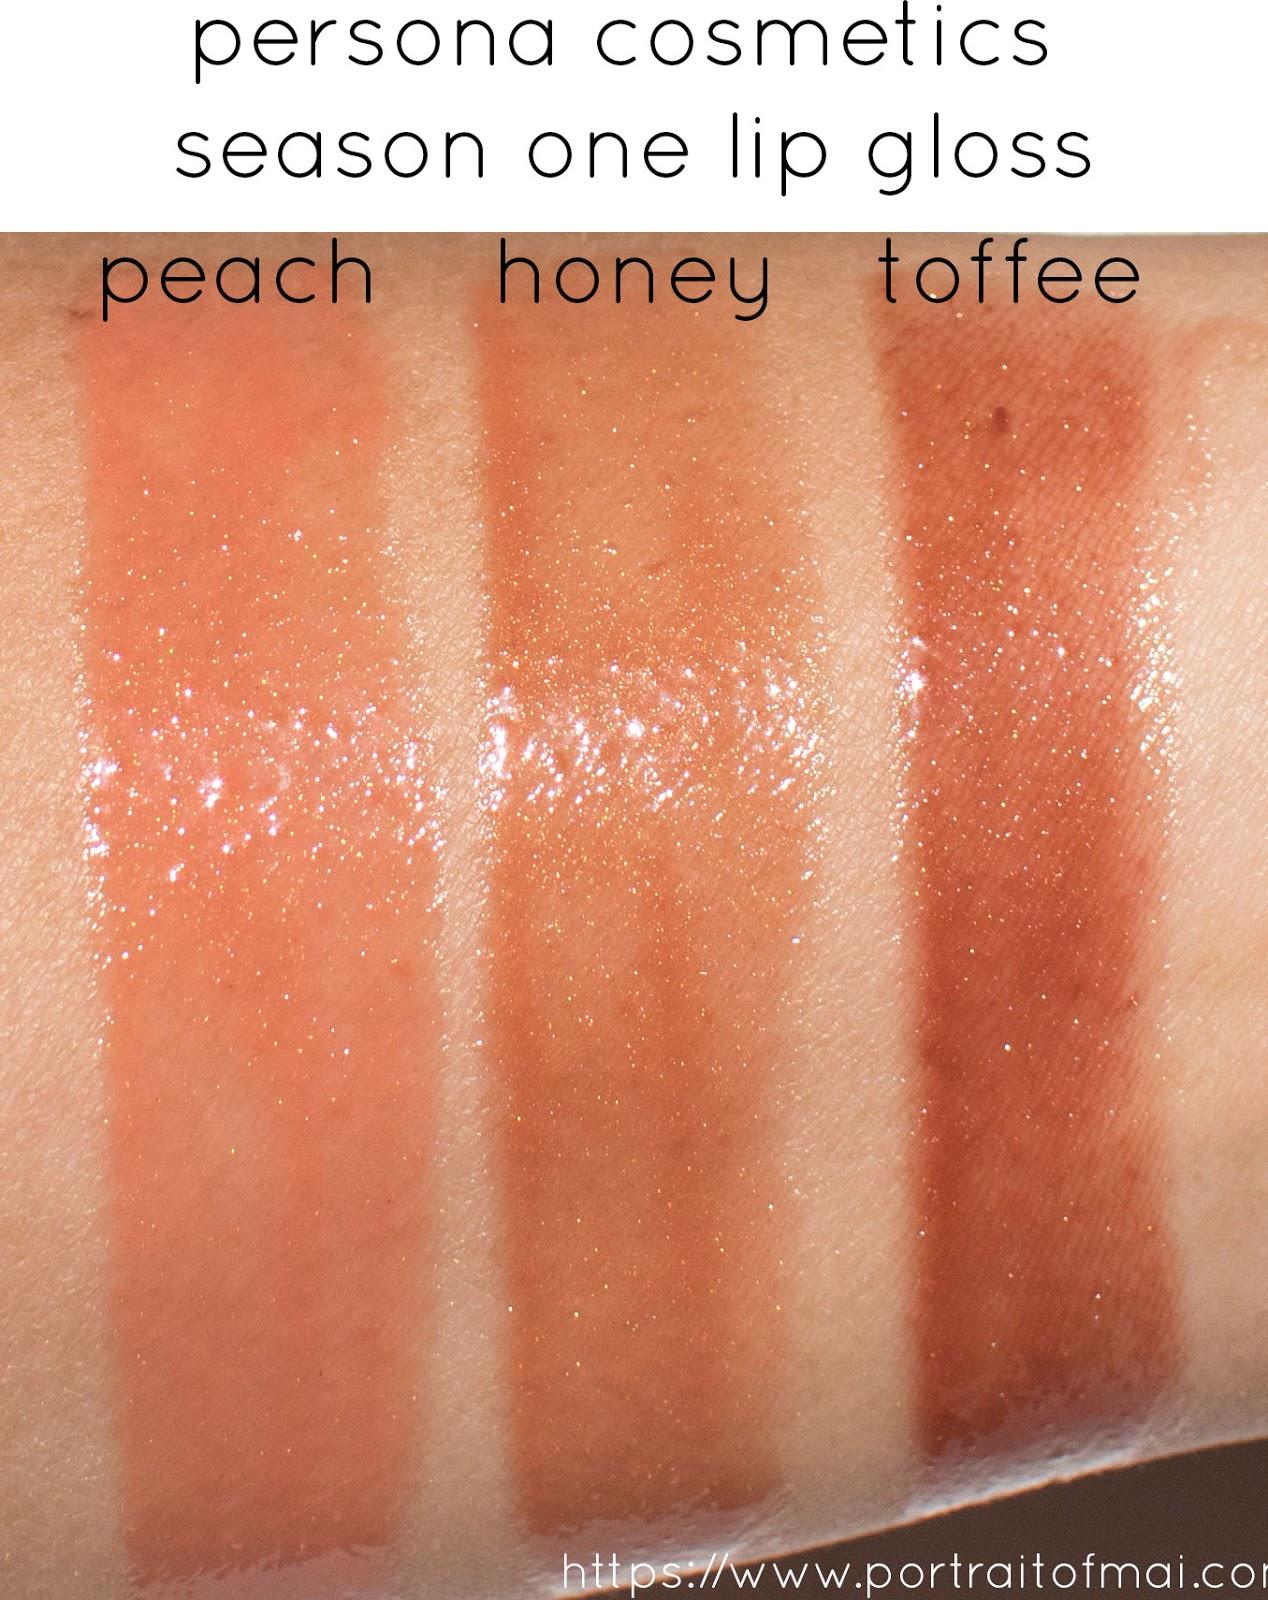 Persona Cosmetics Season One Lip Gloss Arm Swatch